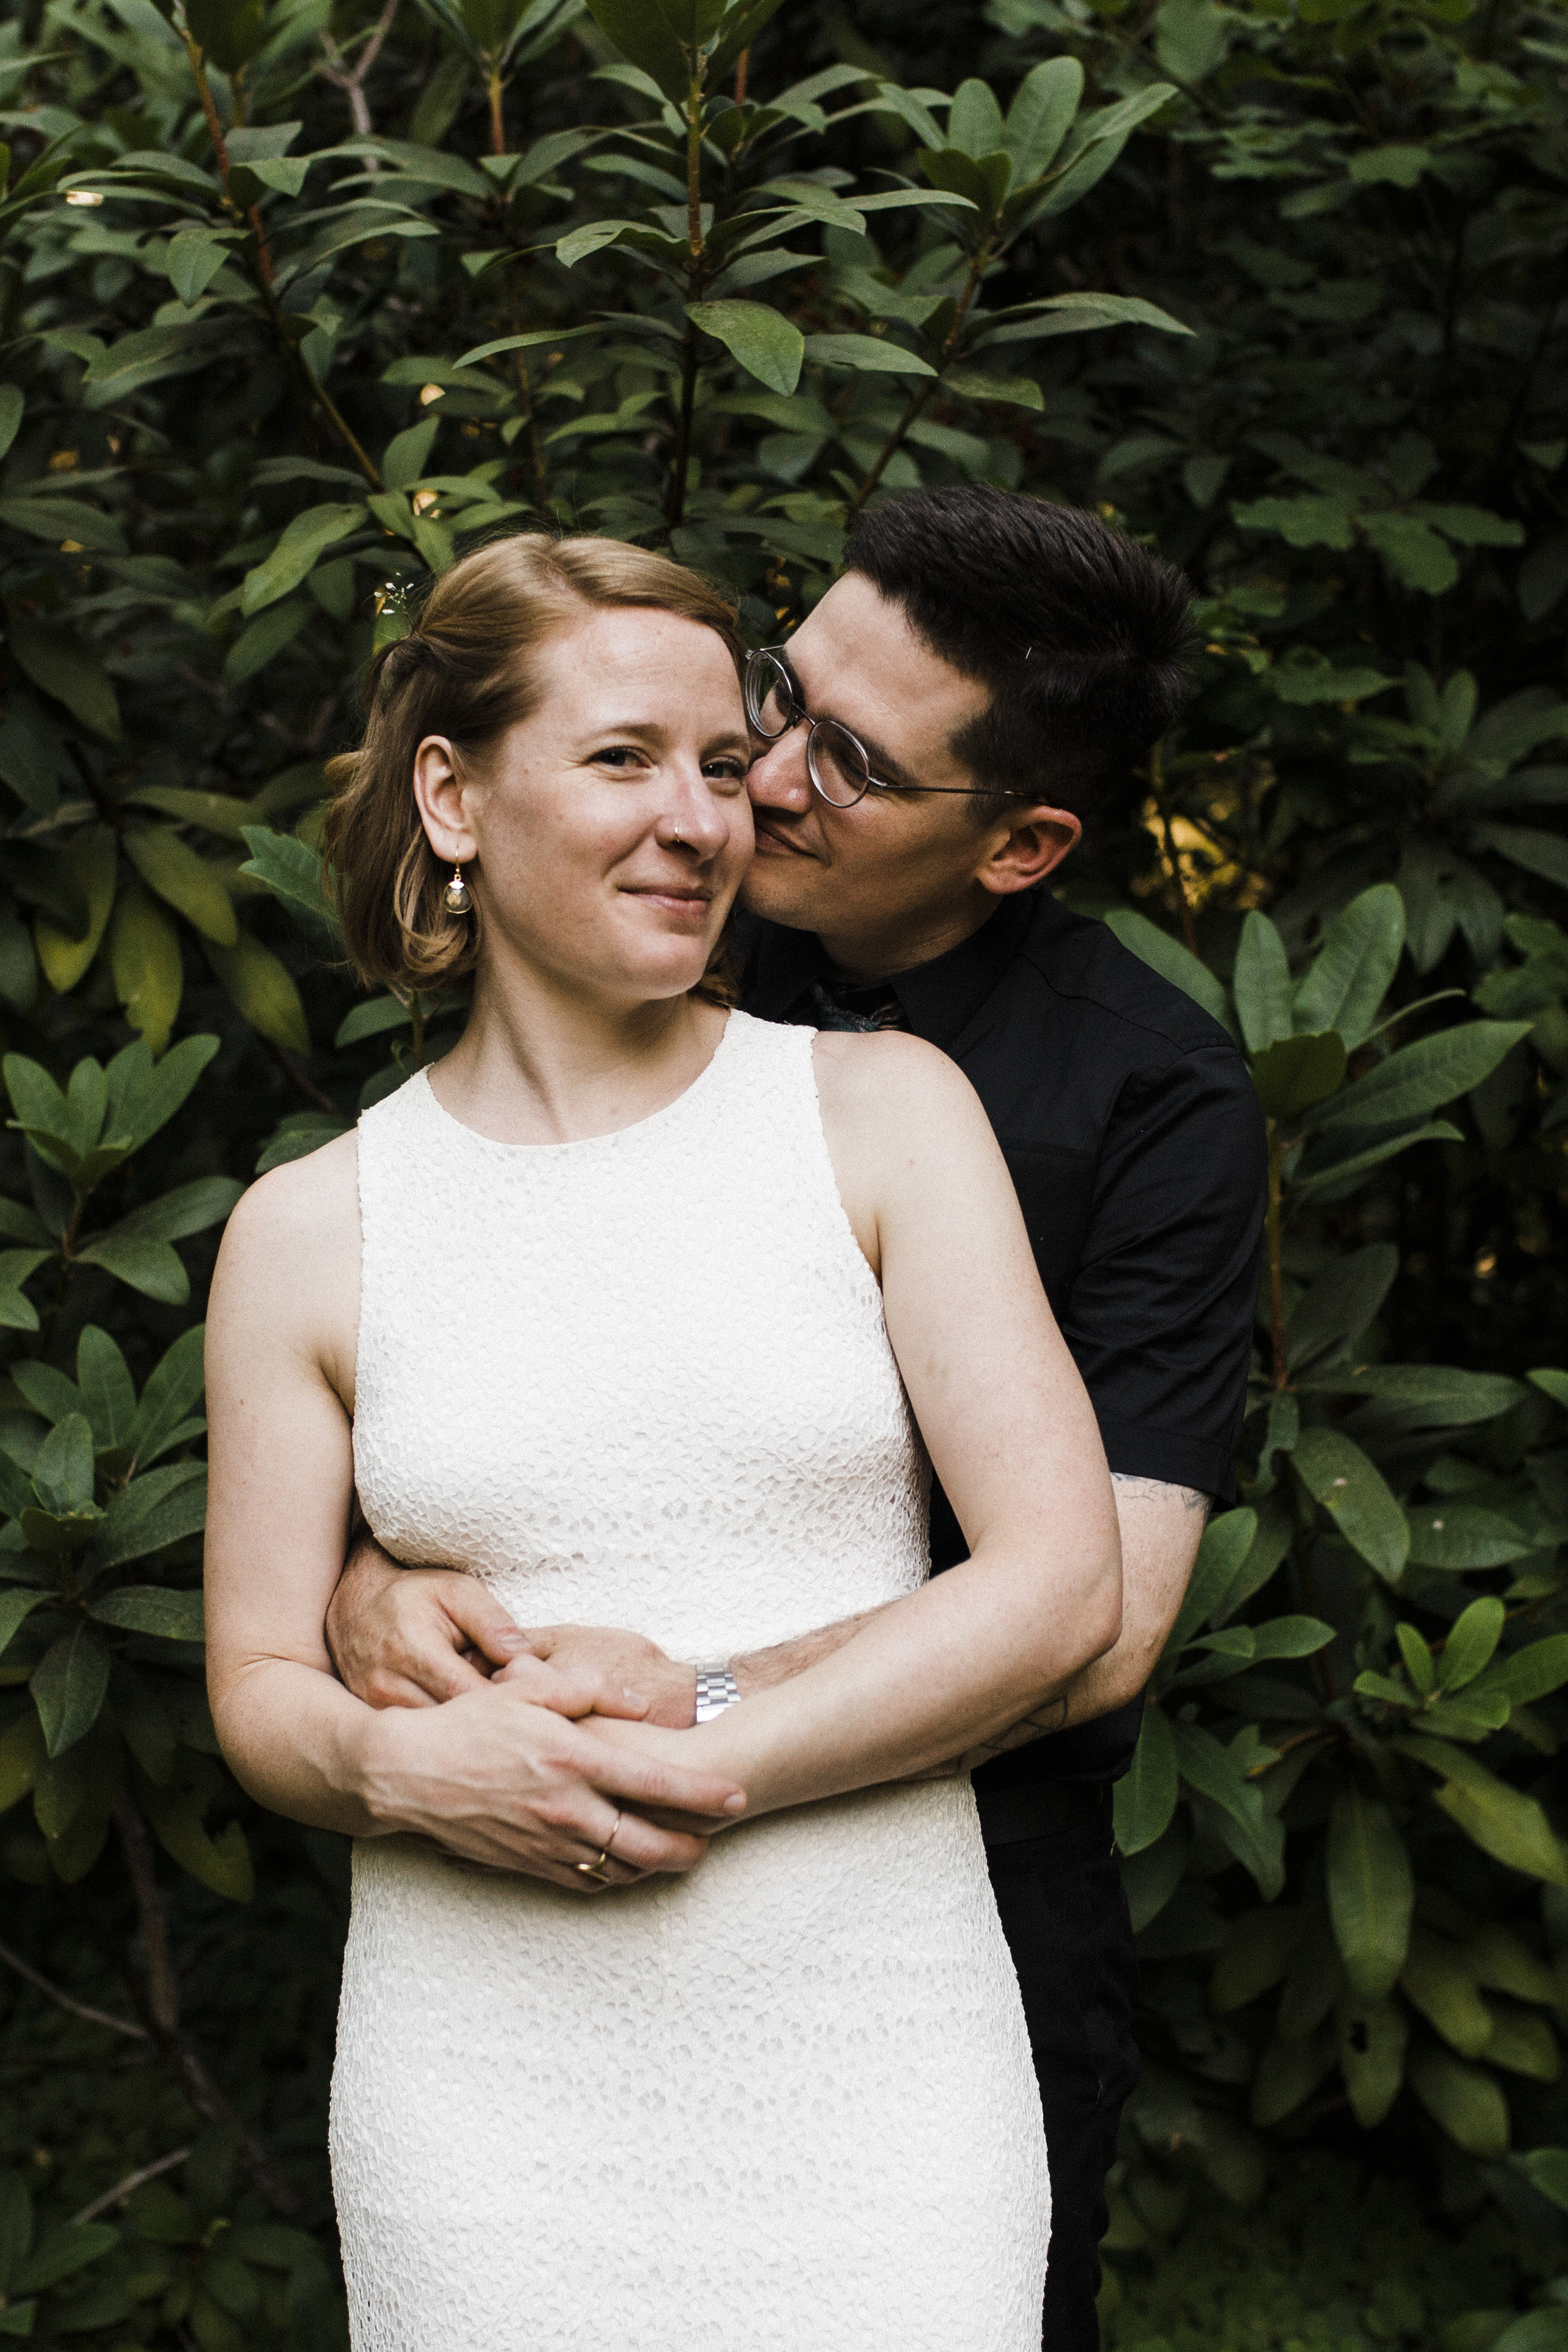 Bend-OR-Wedding-Photographer-20.jpg